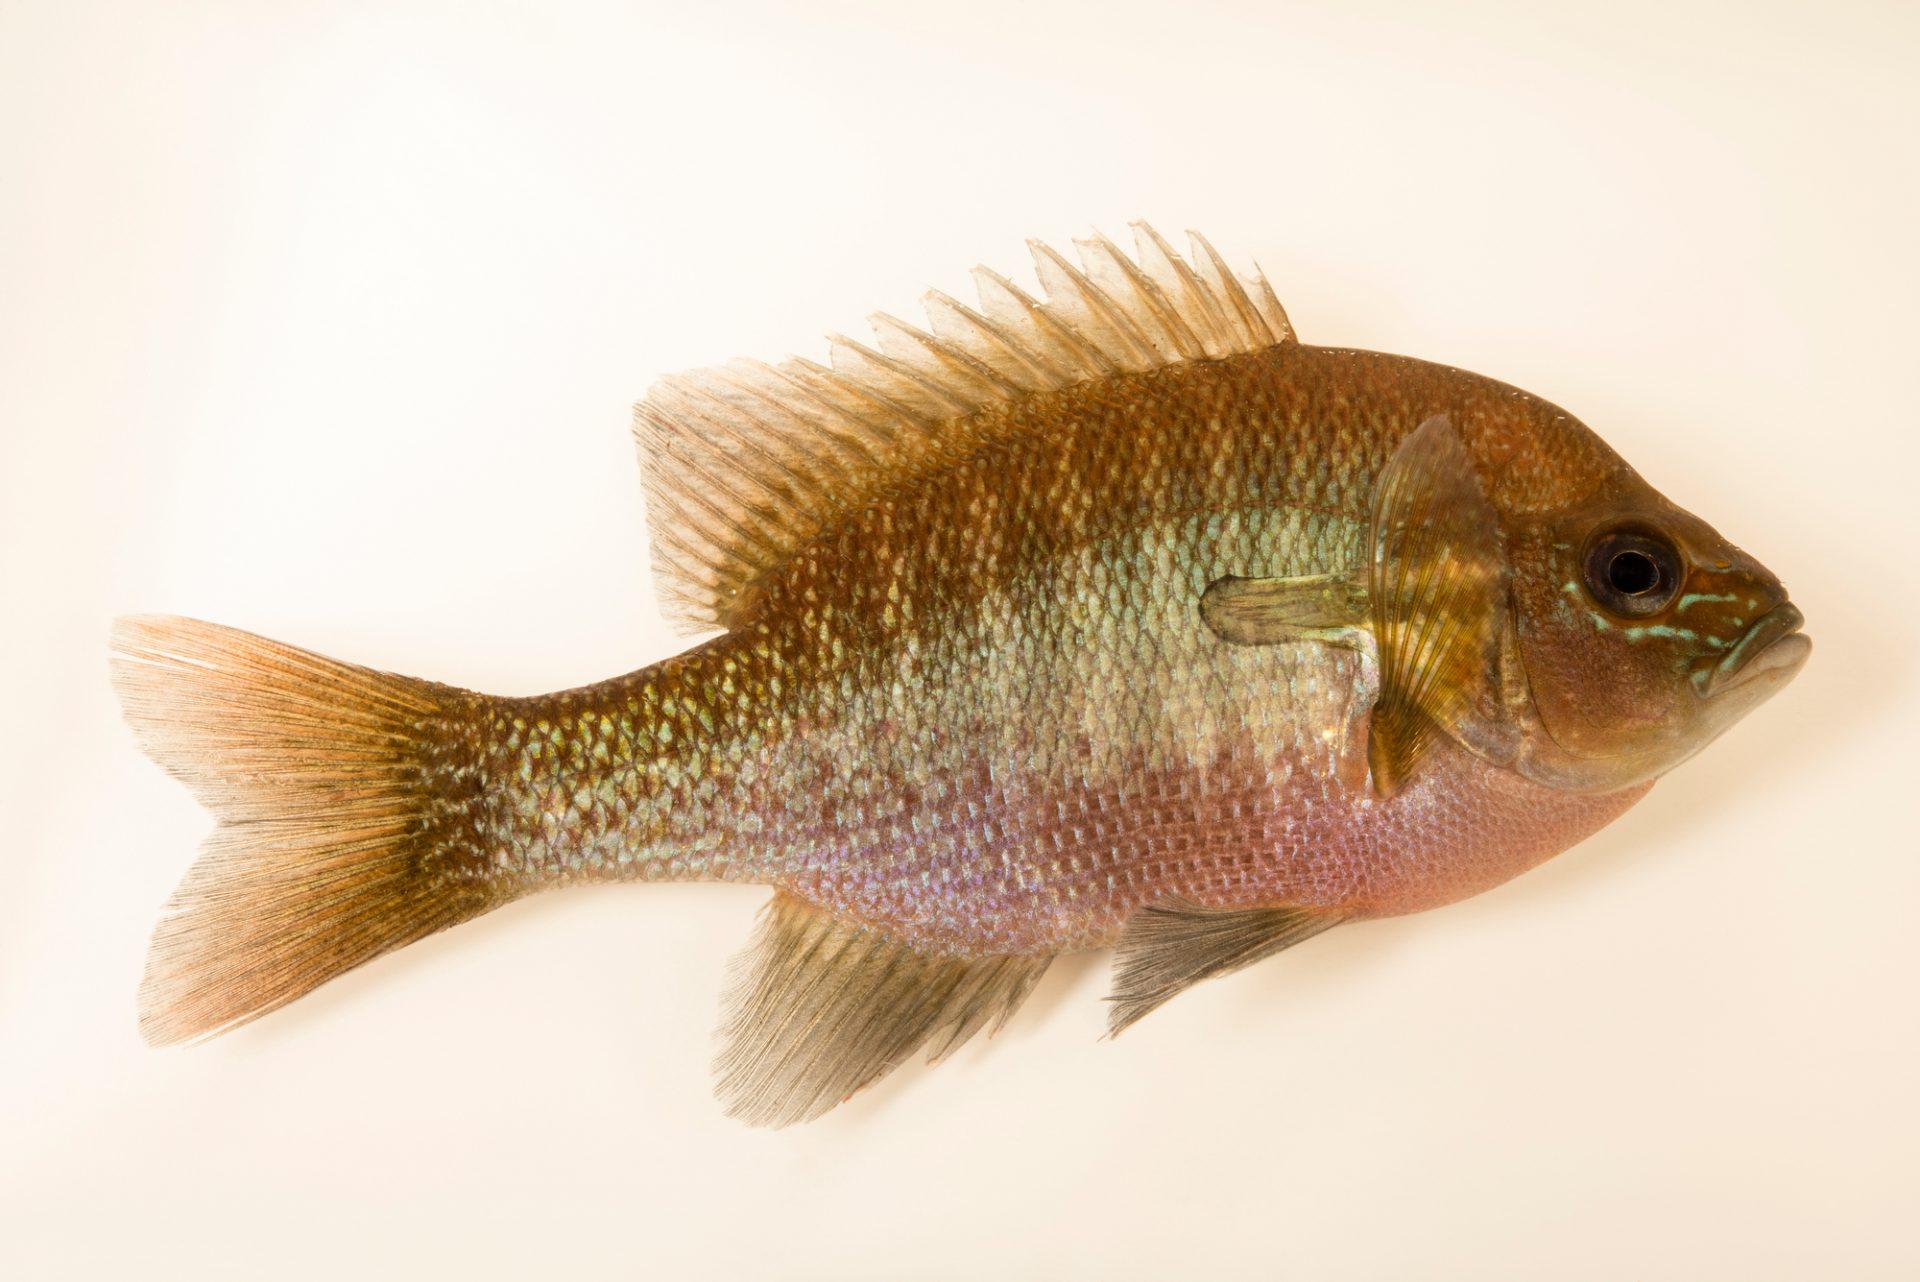 Photo: Redbreast Sunfish (Lepomis auritus) at Welaka National Fish Hatchery Aquarium.